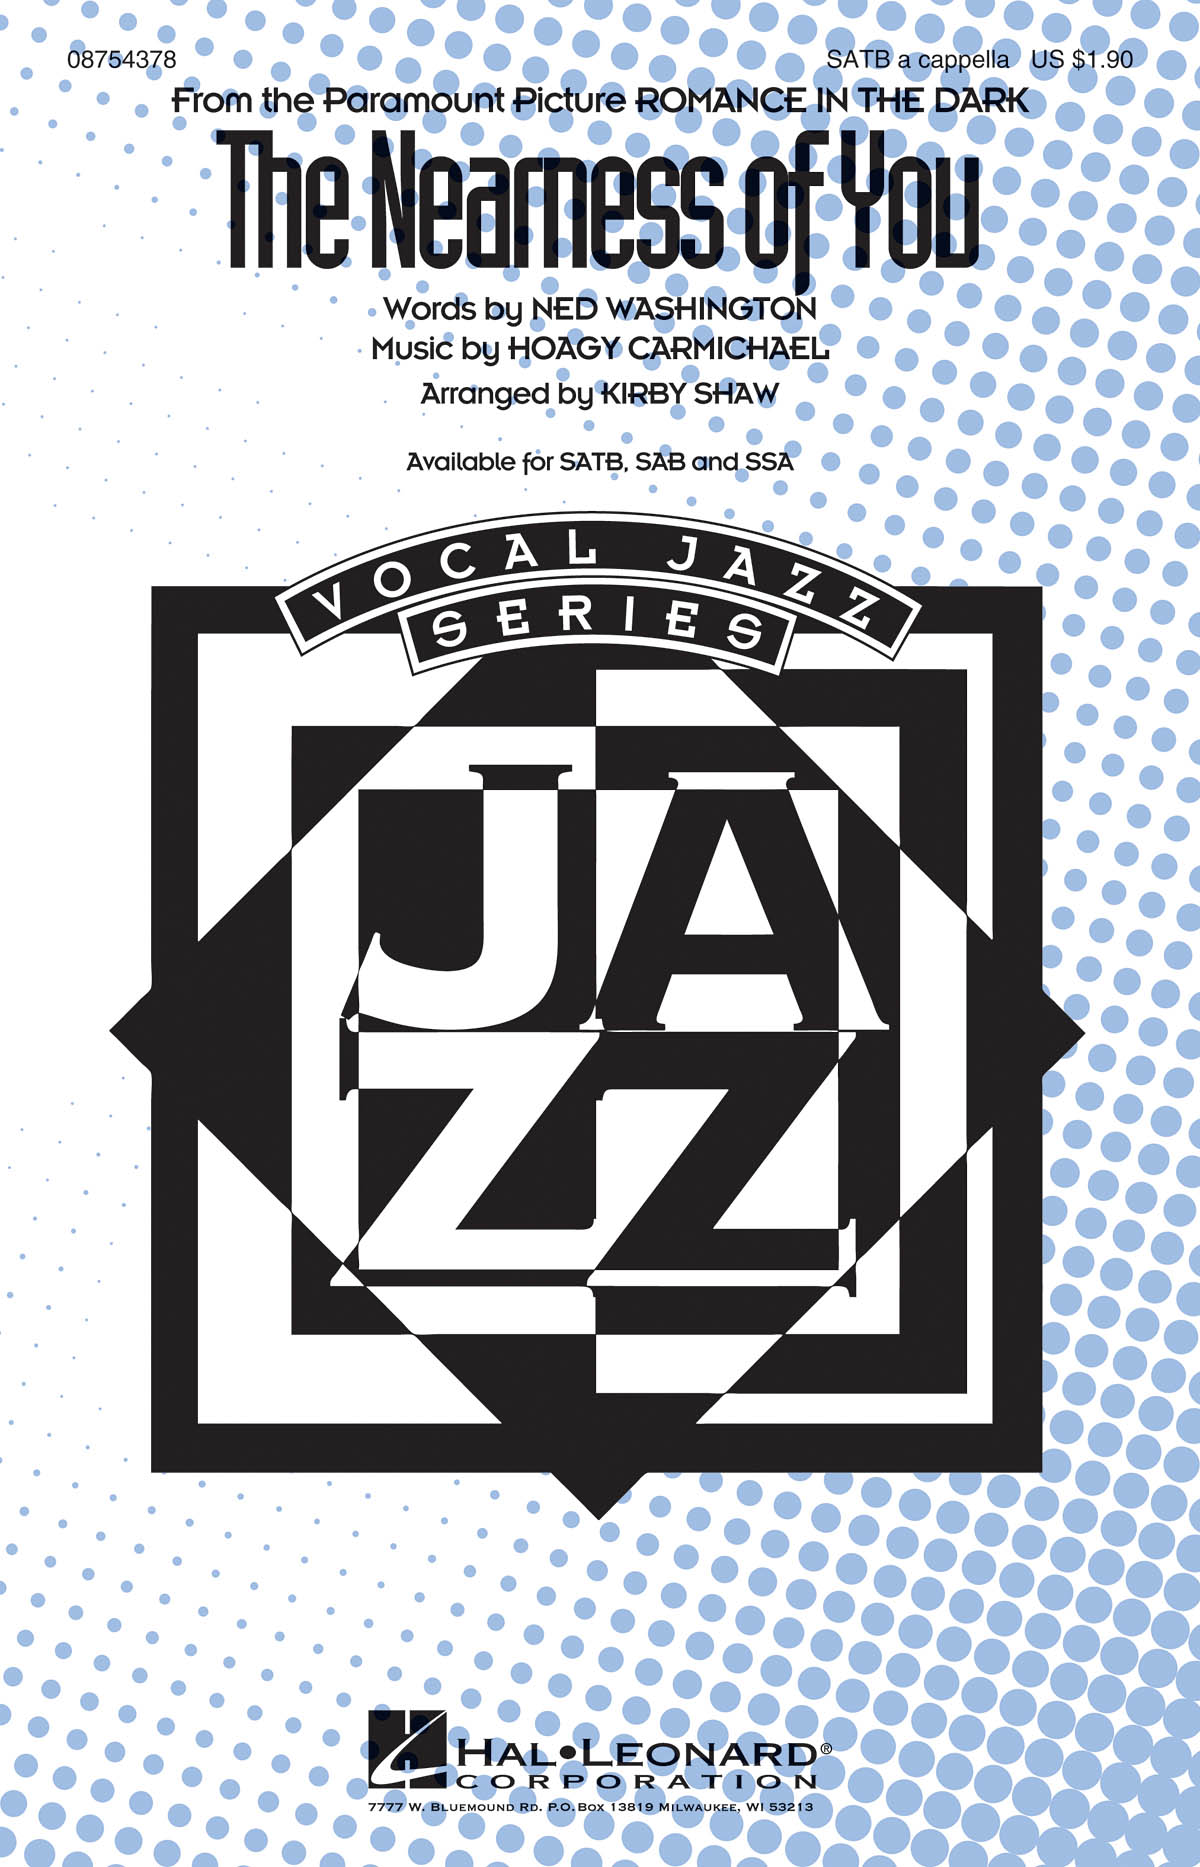 Hoagy Carmichael: The Nearness of You: SATB: Vocal Score